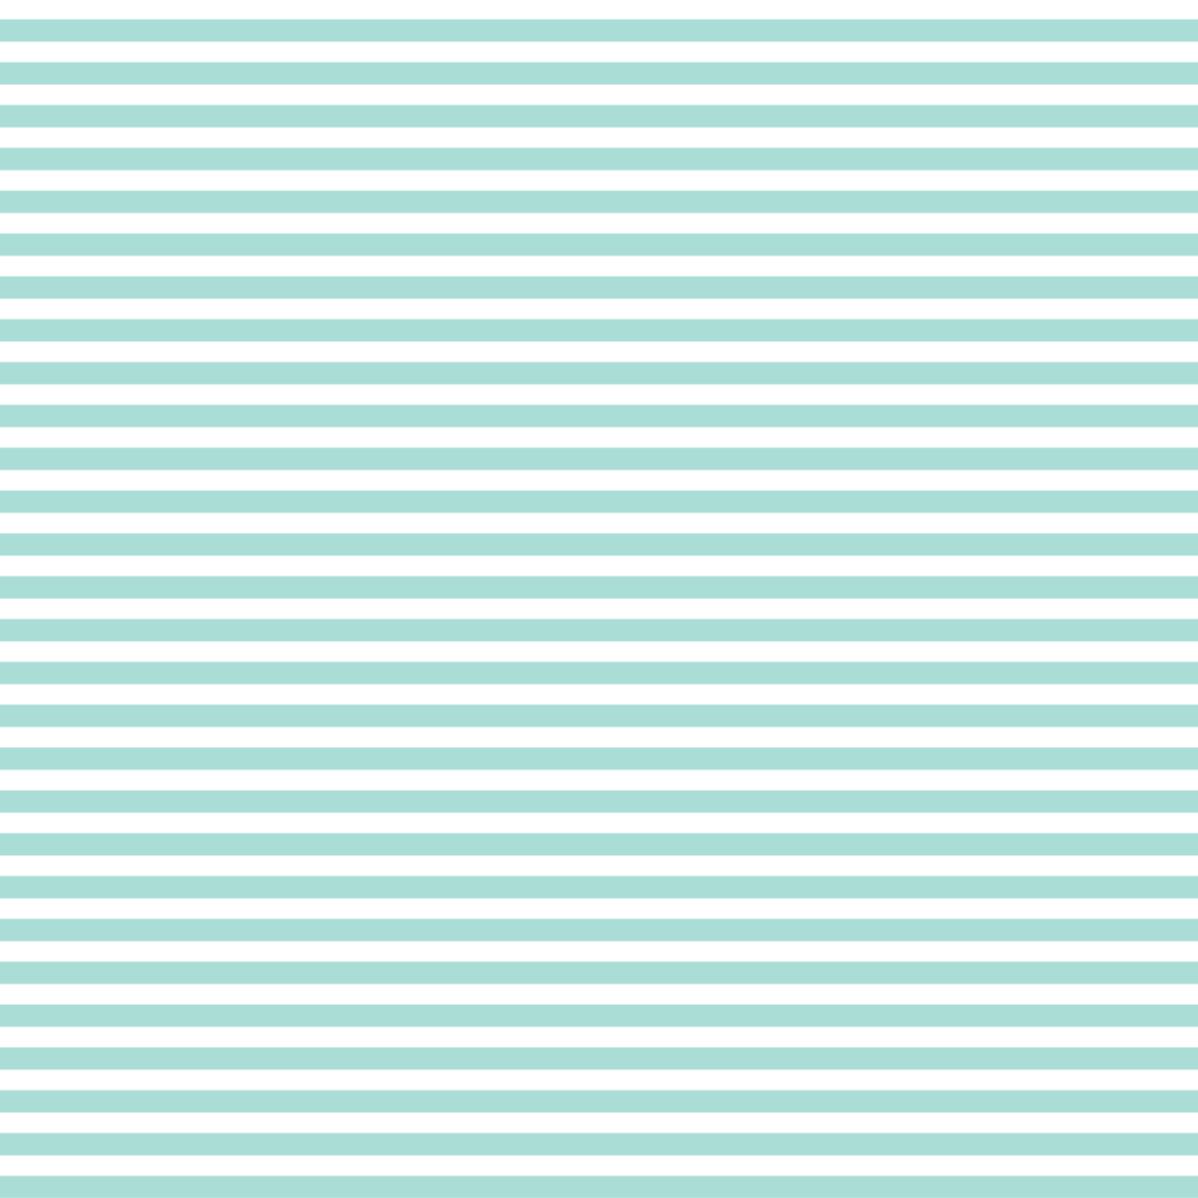 free digital pastel party scrapbooking papers ausdruckbares geschenkpapier freebie. Black Bedroom Furniture Sets. Home Design Ideas